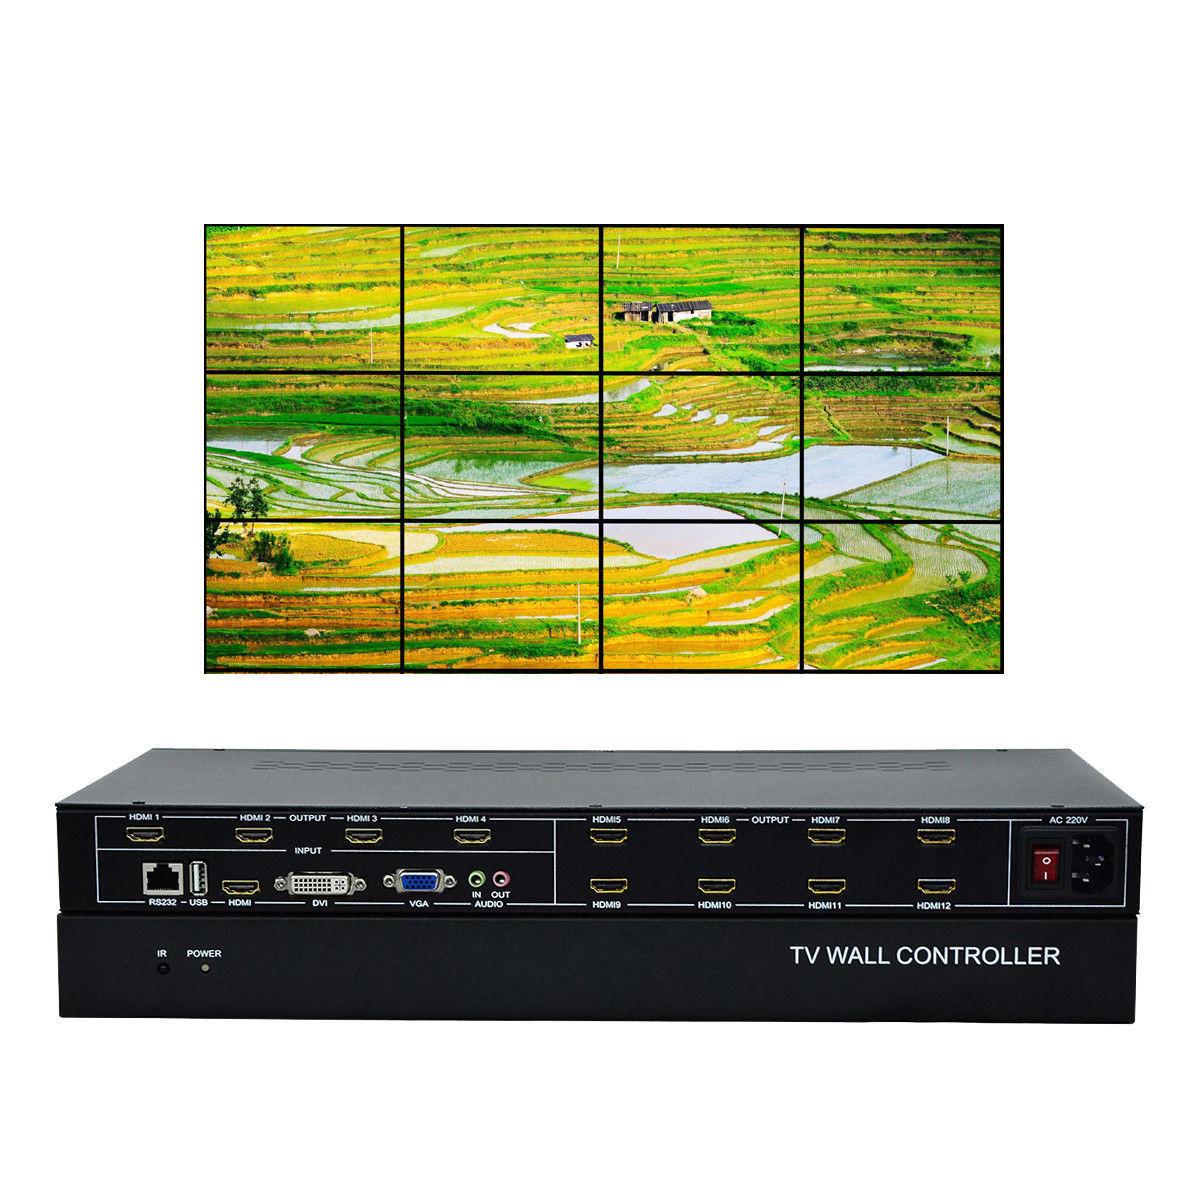 все цены на ESZYM 12 Channel TV Video Wall Controller 3x4 2x6 2x5 HDMI DVI VGA USB Video Processor